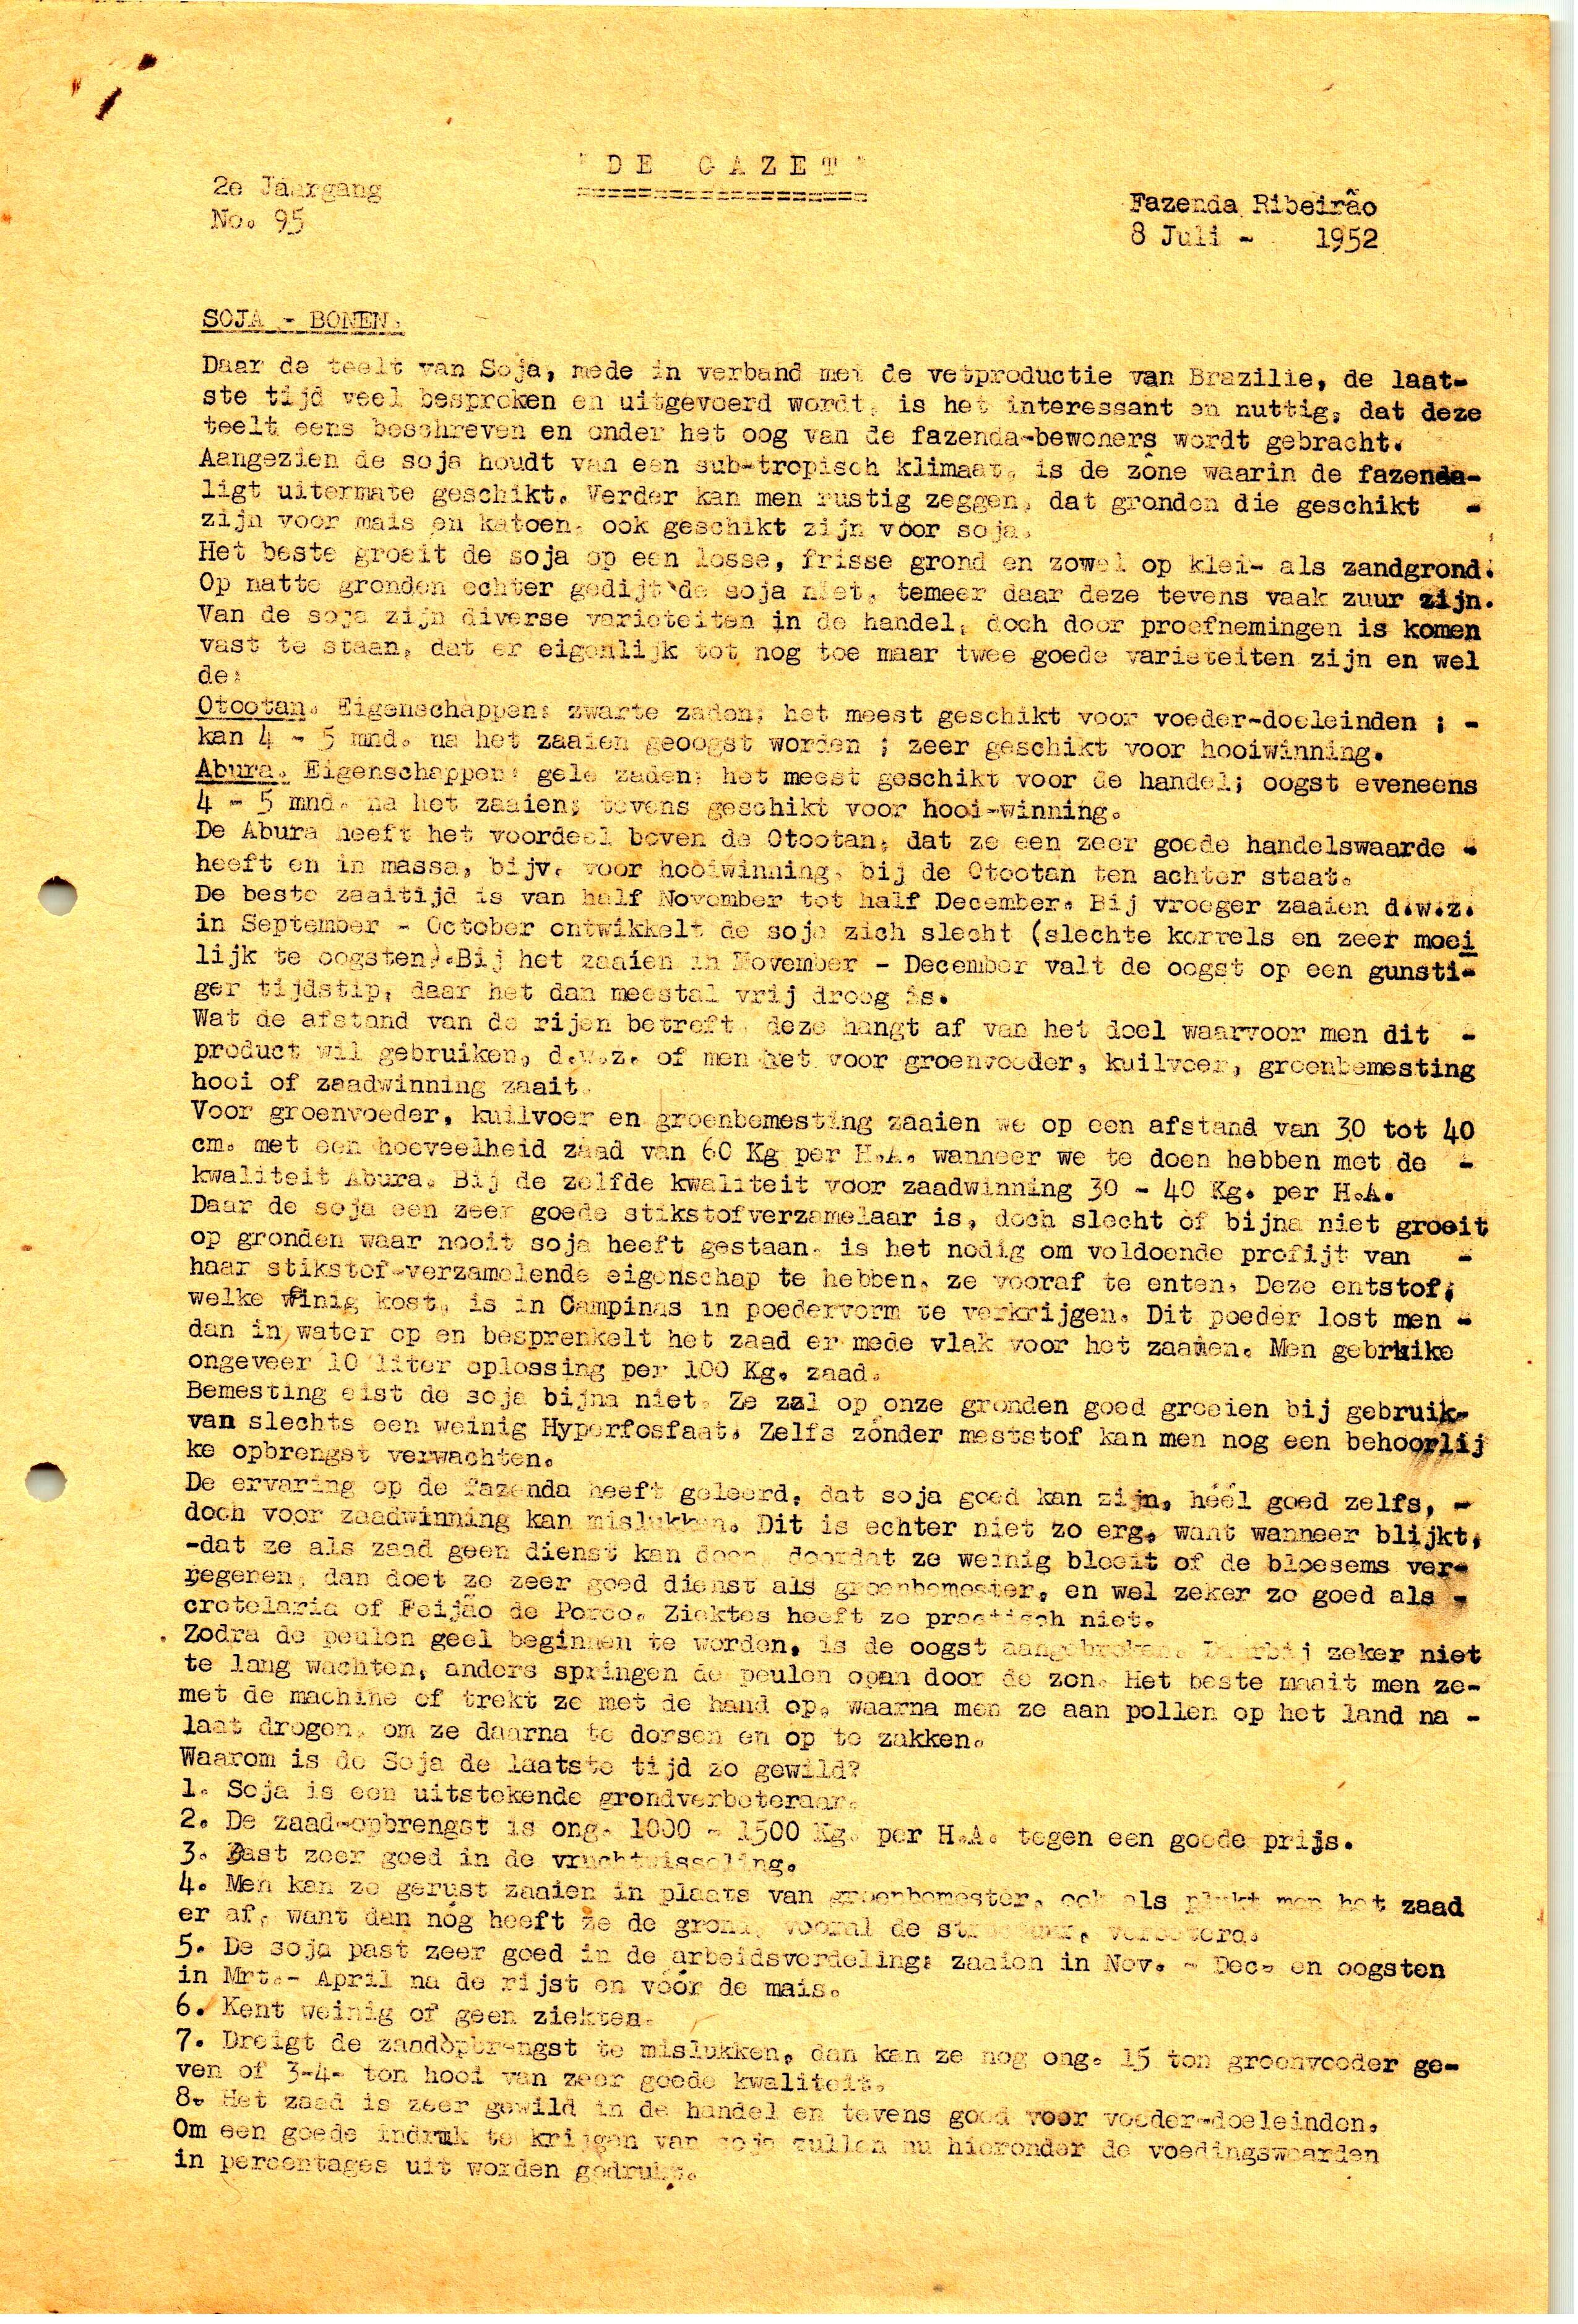 DE GAZET N°95 - 2° ANO